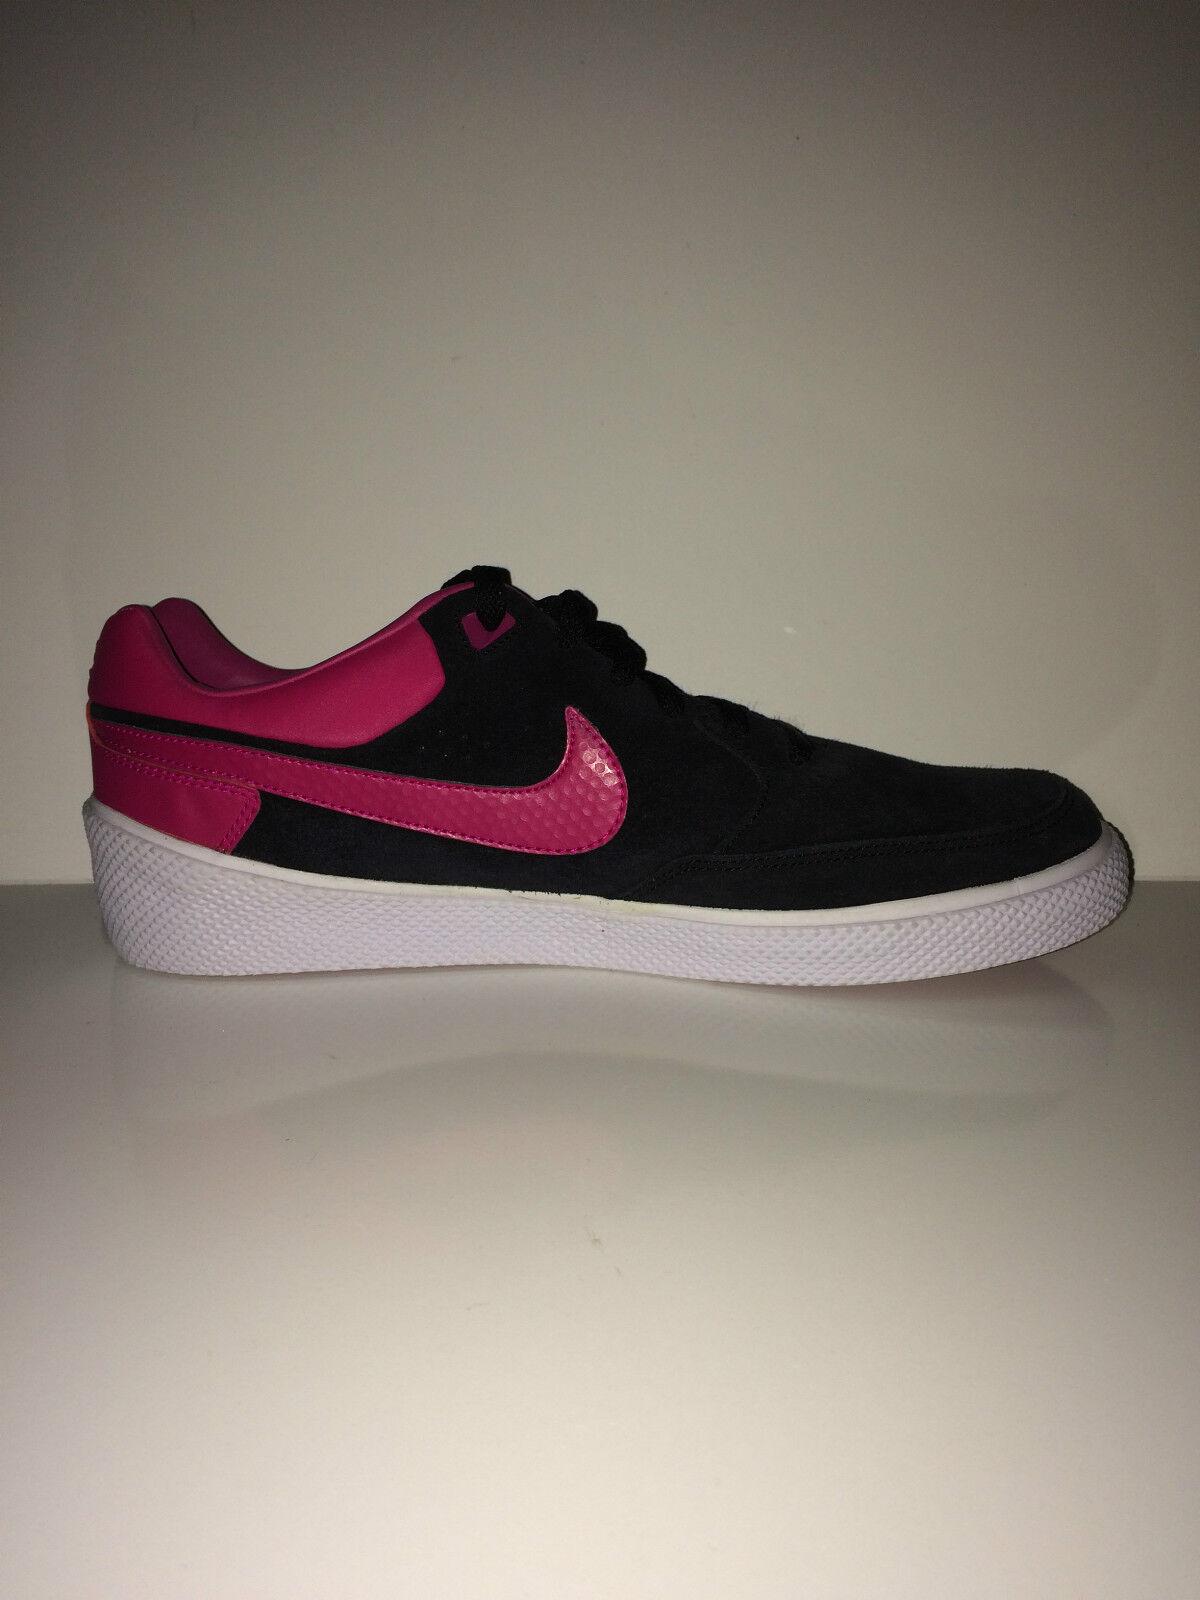 New Nike 525239 Street Gato AC Men's shoes  sz 9.5M